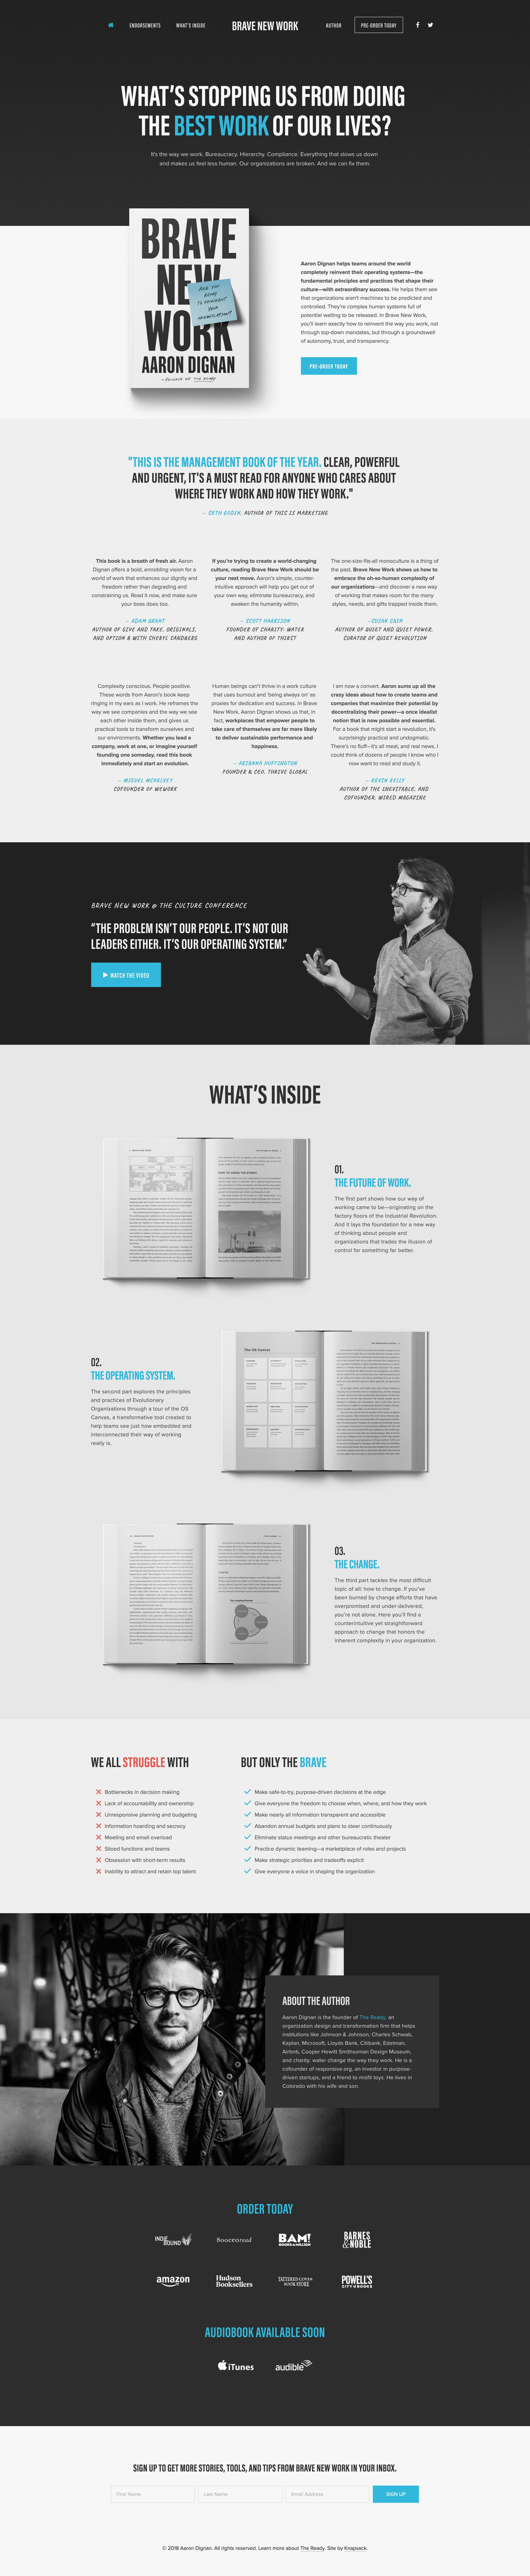 Brave-New-Work-Macbook-Overlay.jpg